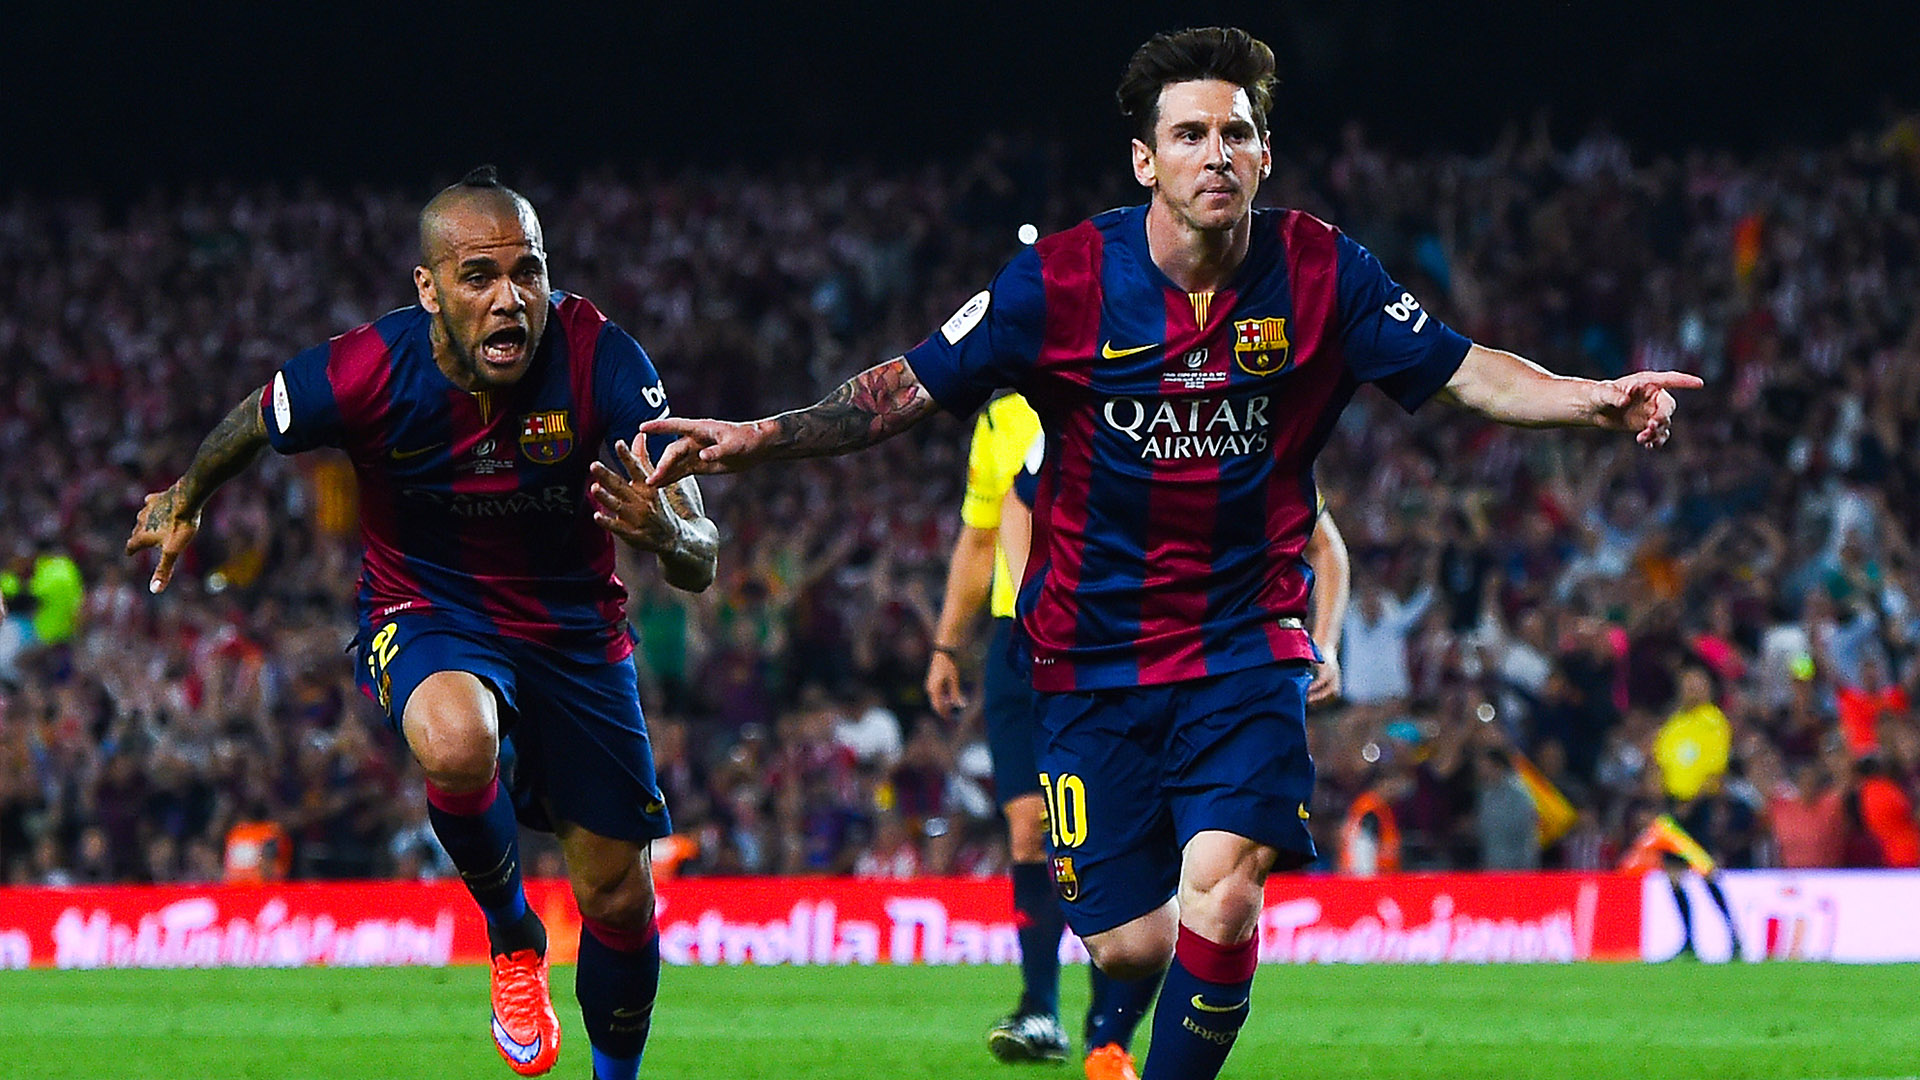 Messi celebrates opening the scoring against Bilbao